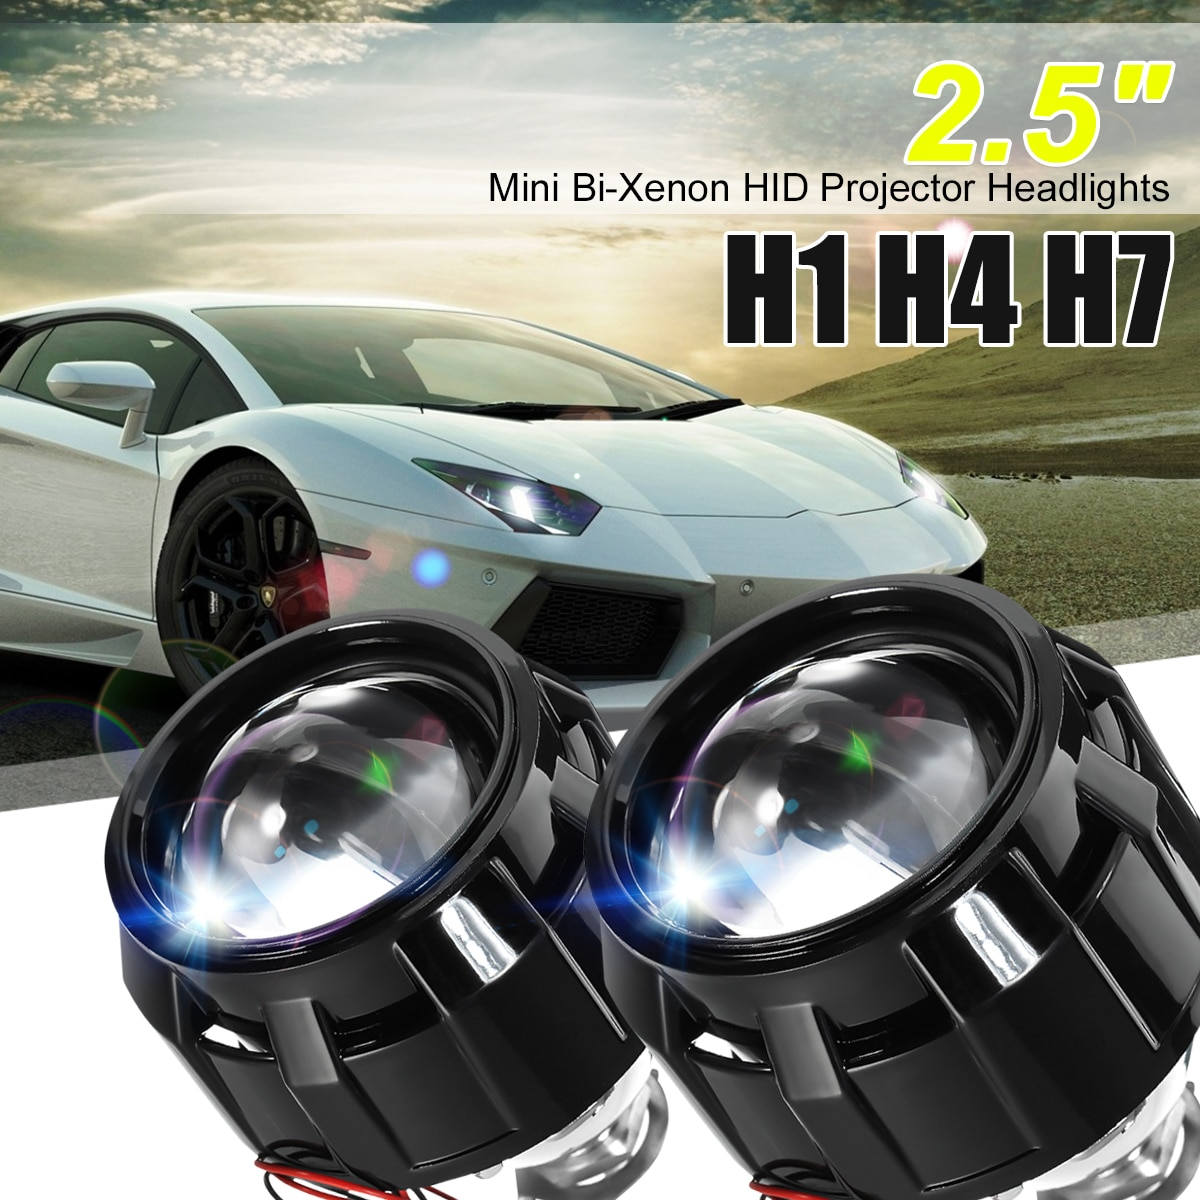 2,5 дюйма мини WST для HID Bi-xenon объектив проектора + кожухи LHD RHD для авто ангельские глазные фары H1 H4 H7